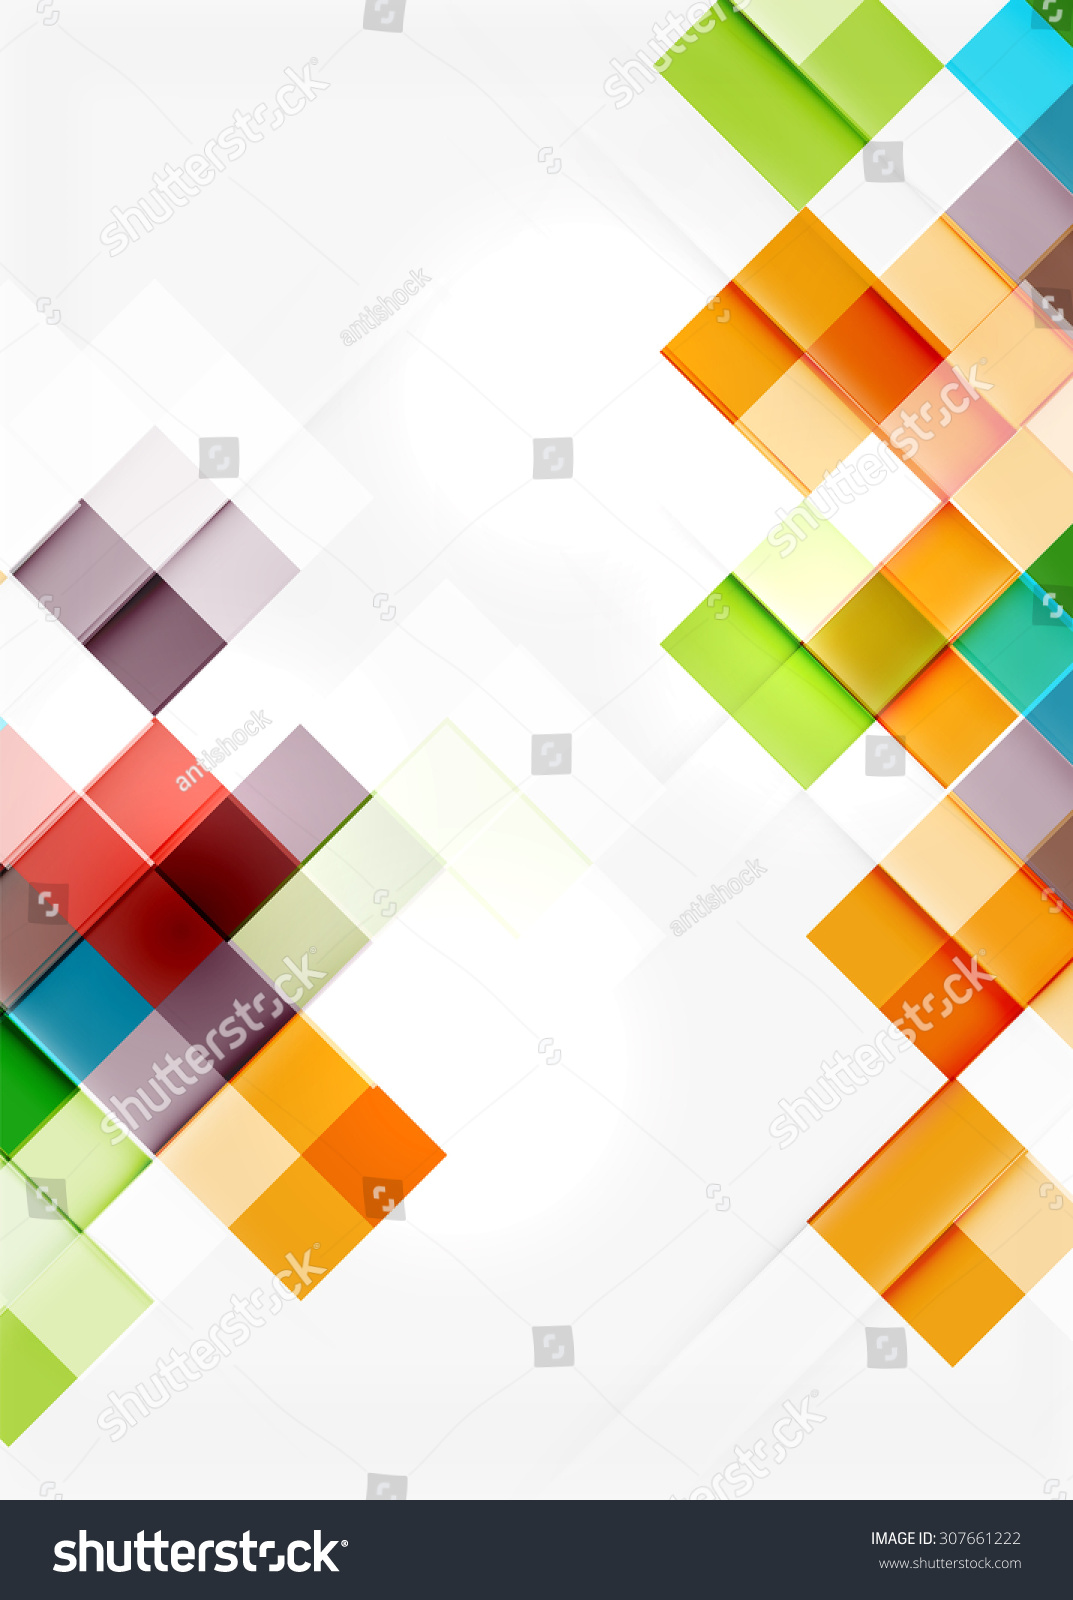 Square shape mosaic pattern design universal stock for Tile layout app